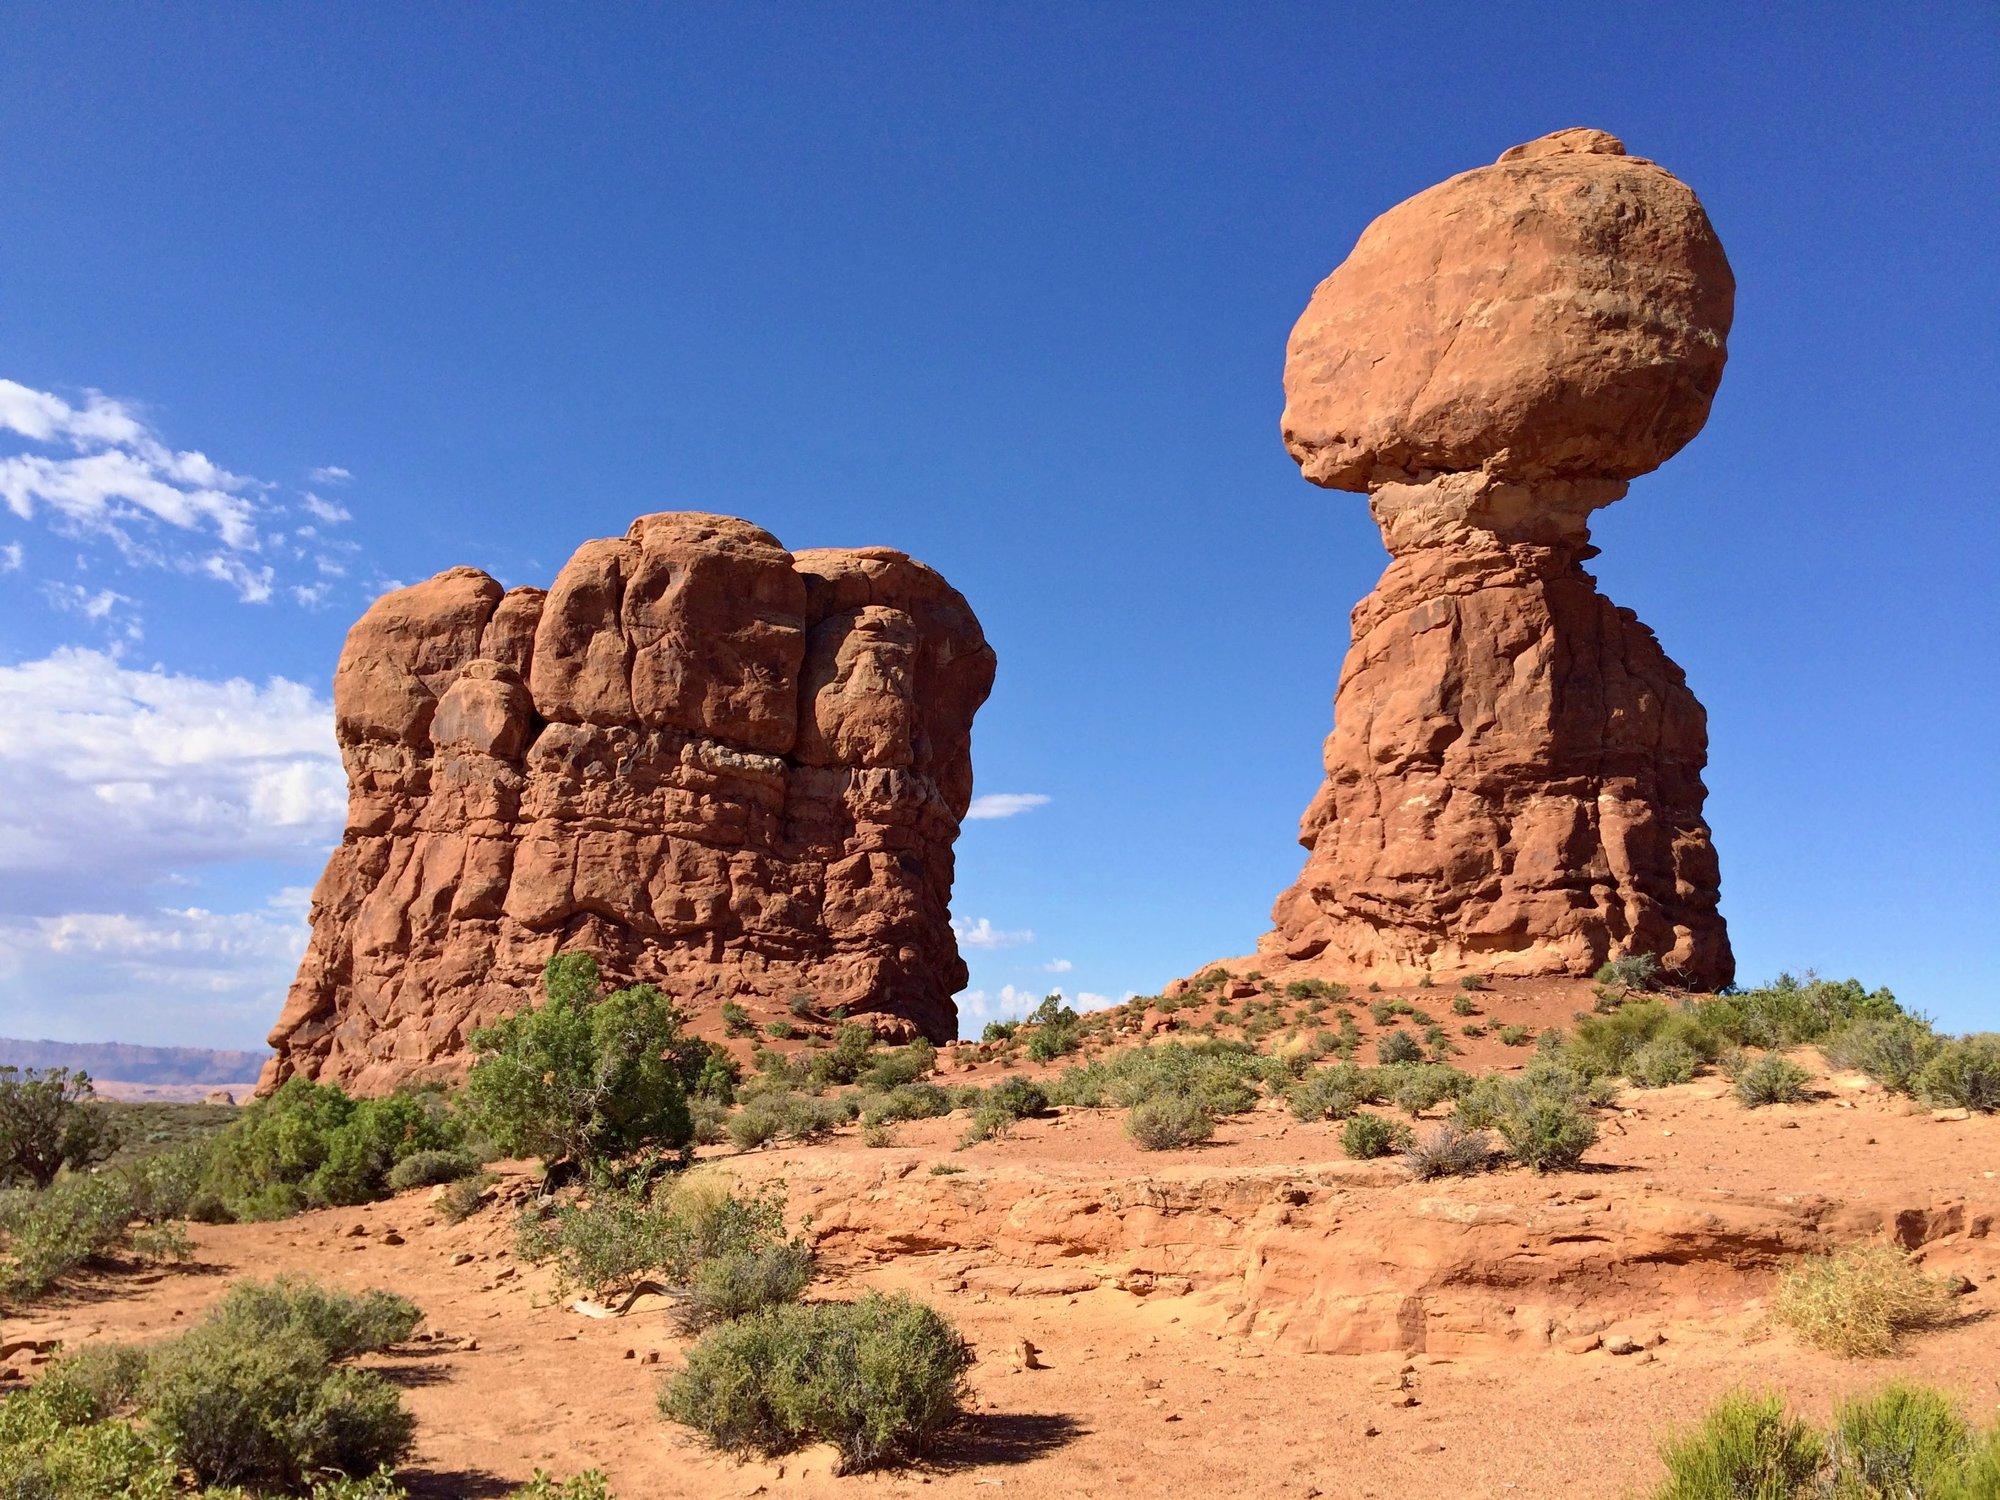 Balanced Rock – результат эрозии